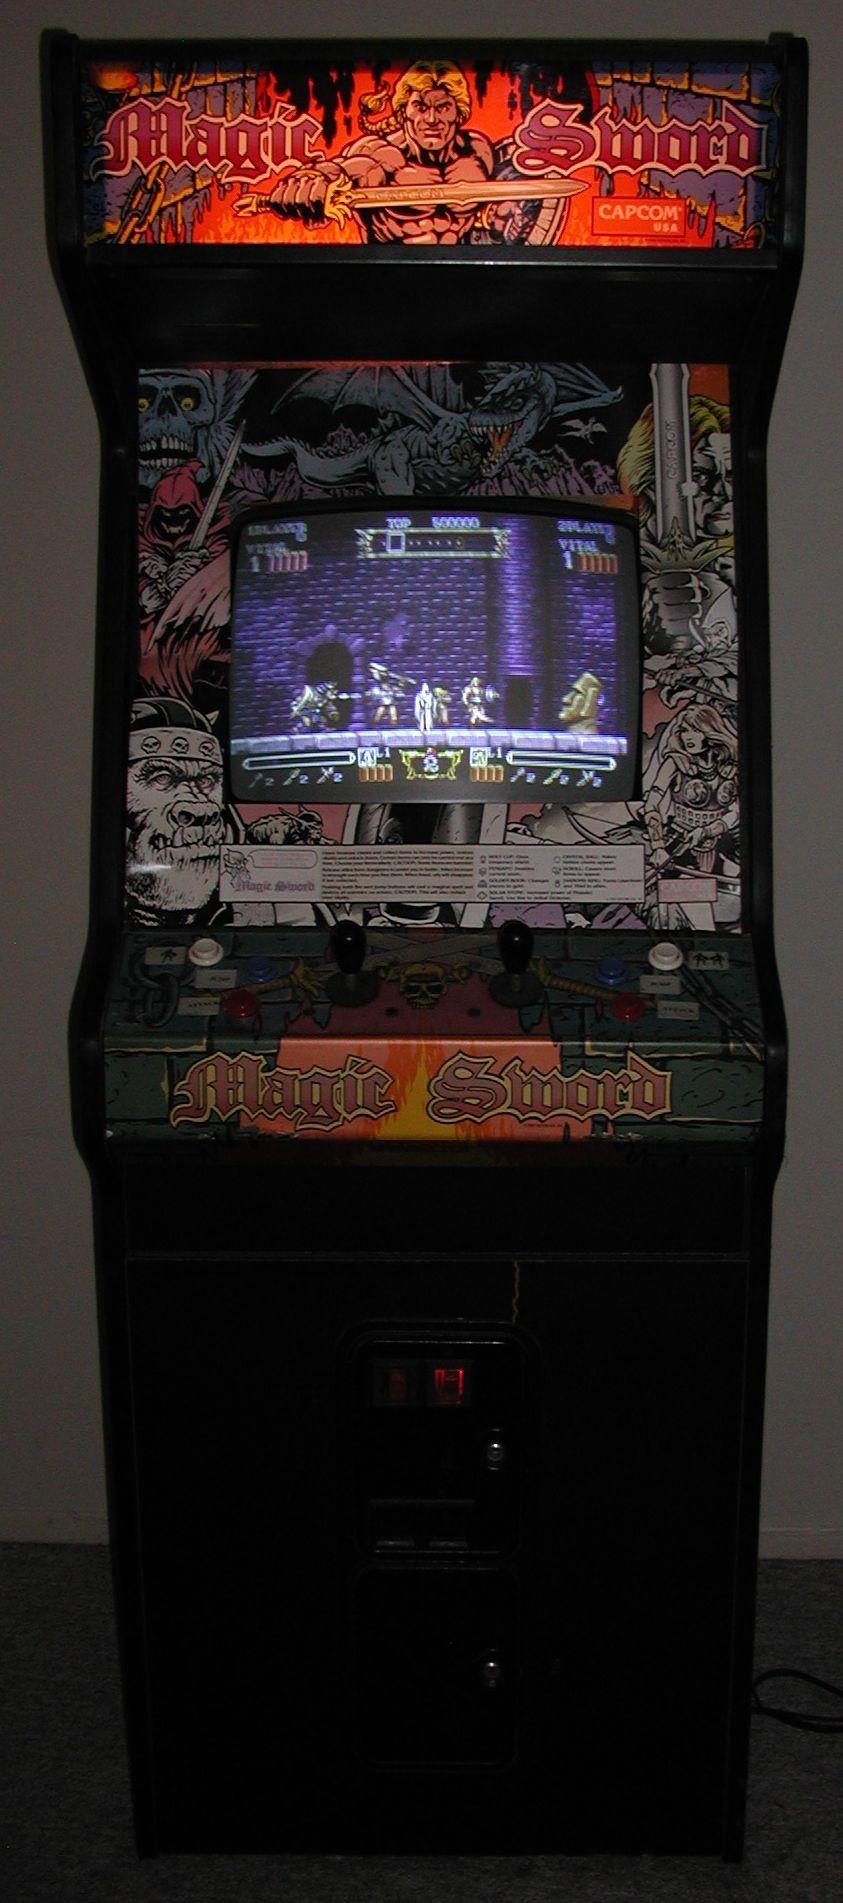 Magic Sword arcade cabinet | The Arcade is on Fire | Pinterest ...